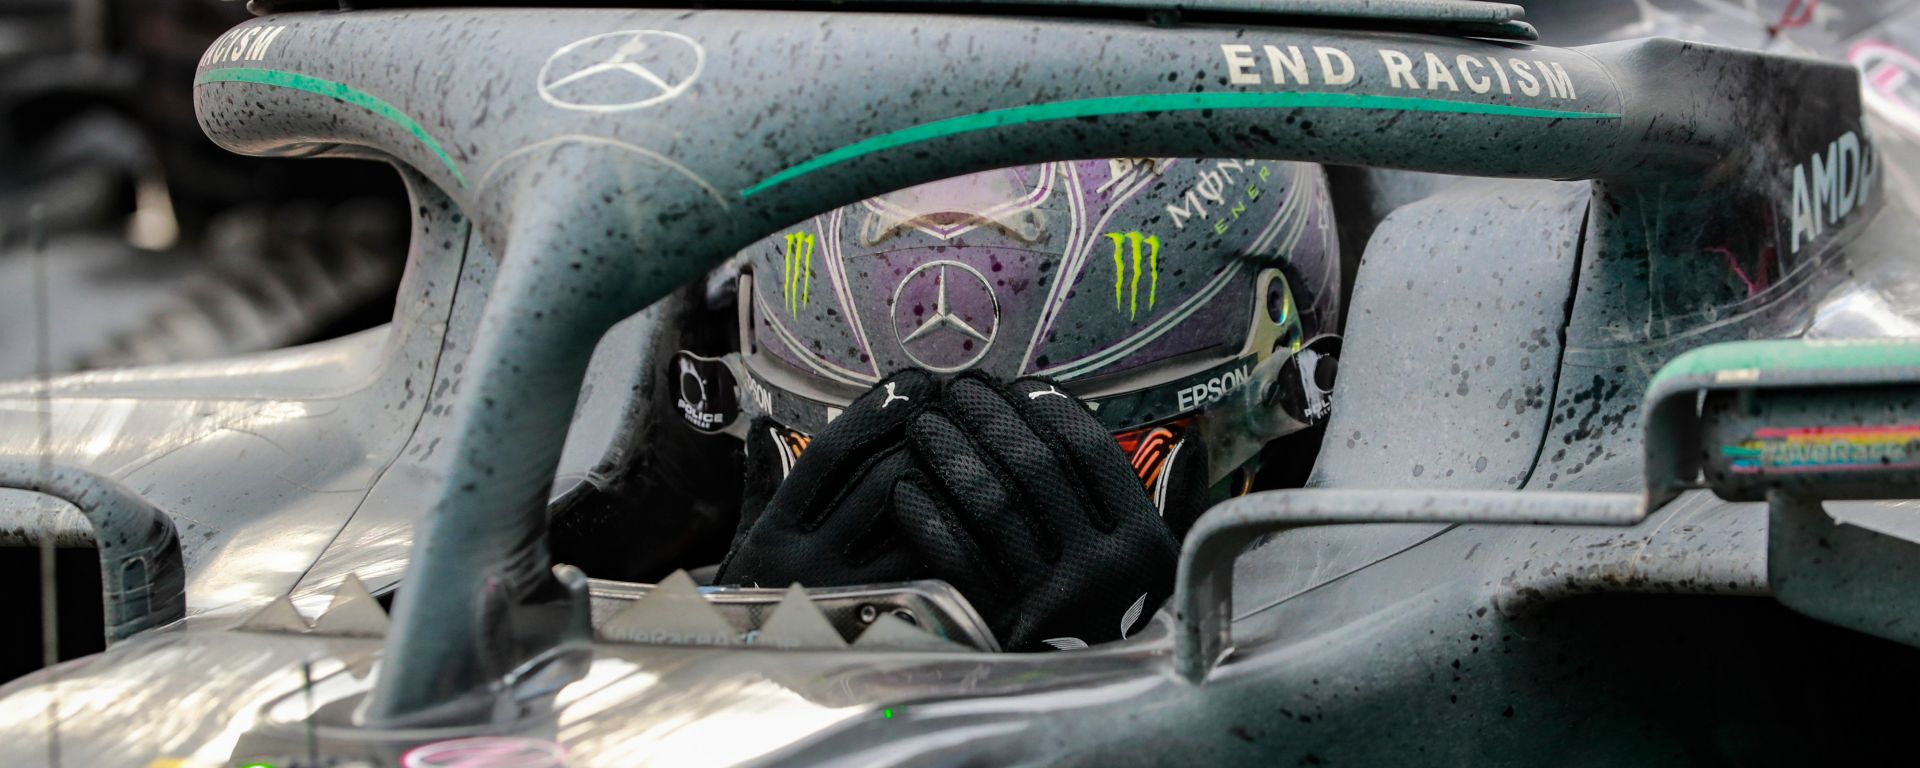 F1, GP Turchia 2020: Lewis Hamilton (Mercedes) festeggia il settimo titolo mondiale